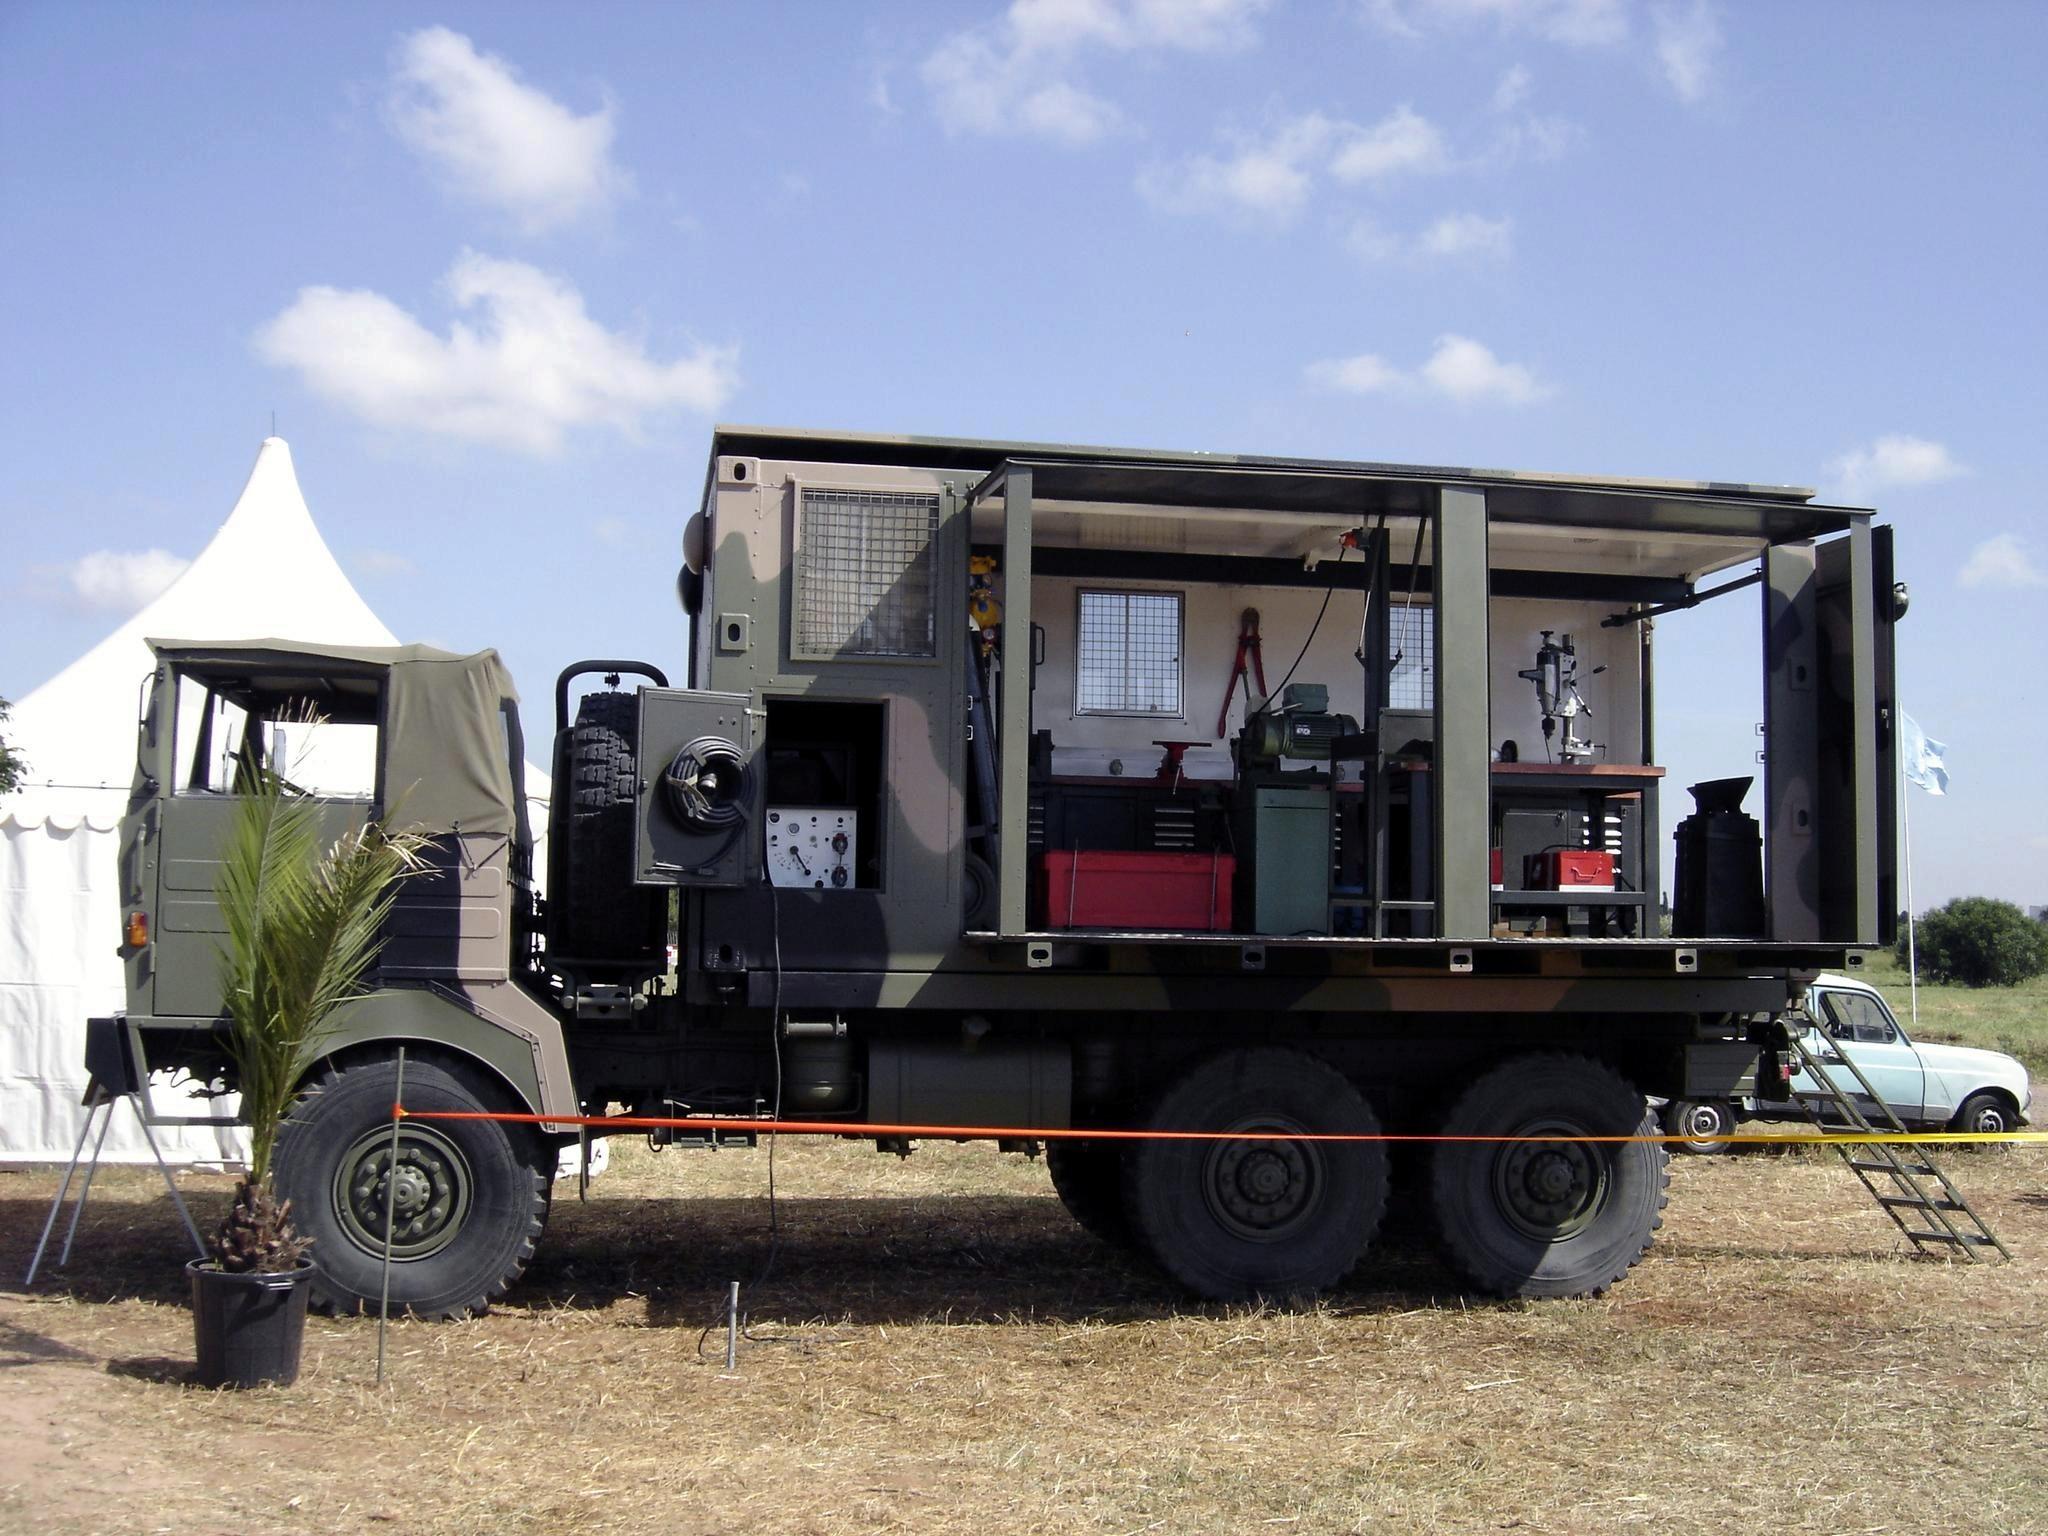 Photos - Logistique et Camions / Logistics and Trucks - Page 7 Clipbo24